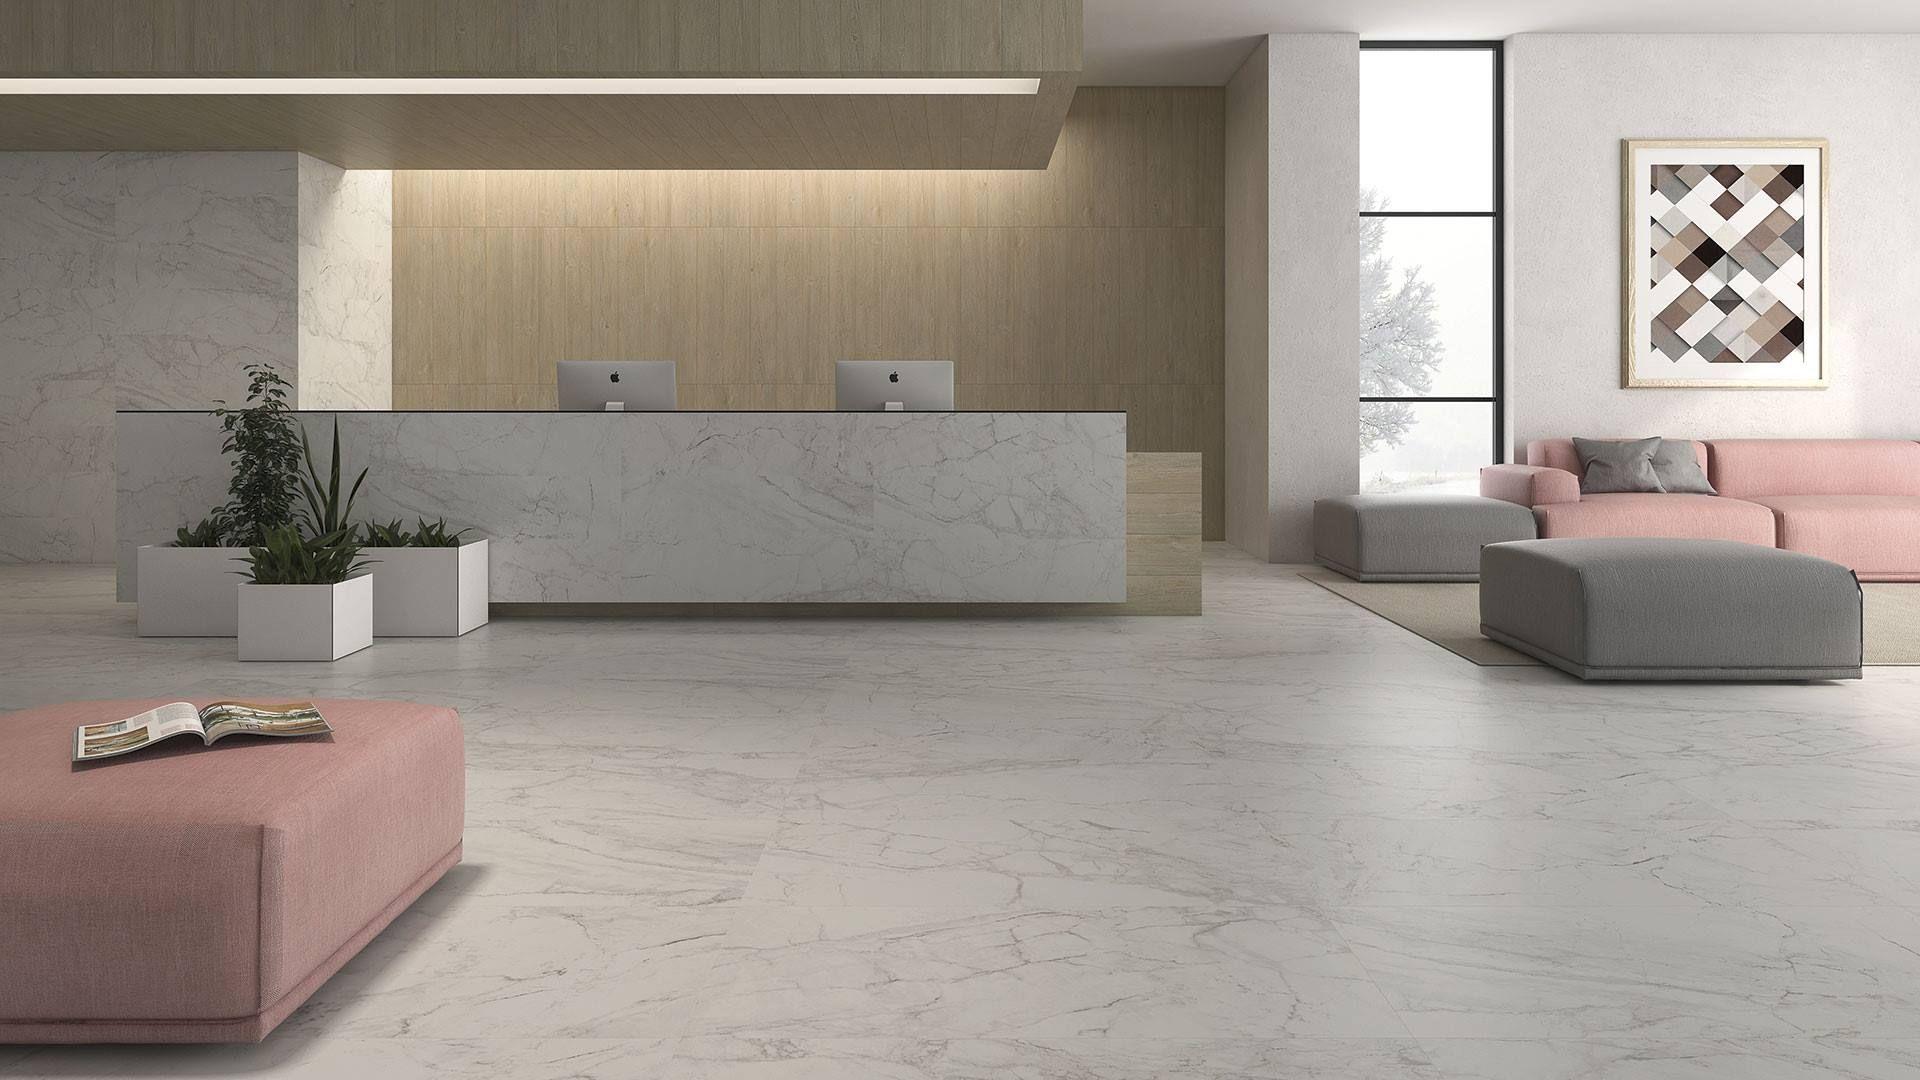 Buy Floor Tiles Online Or In Store Tile Factory Outlet Buying